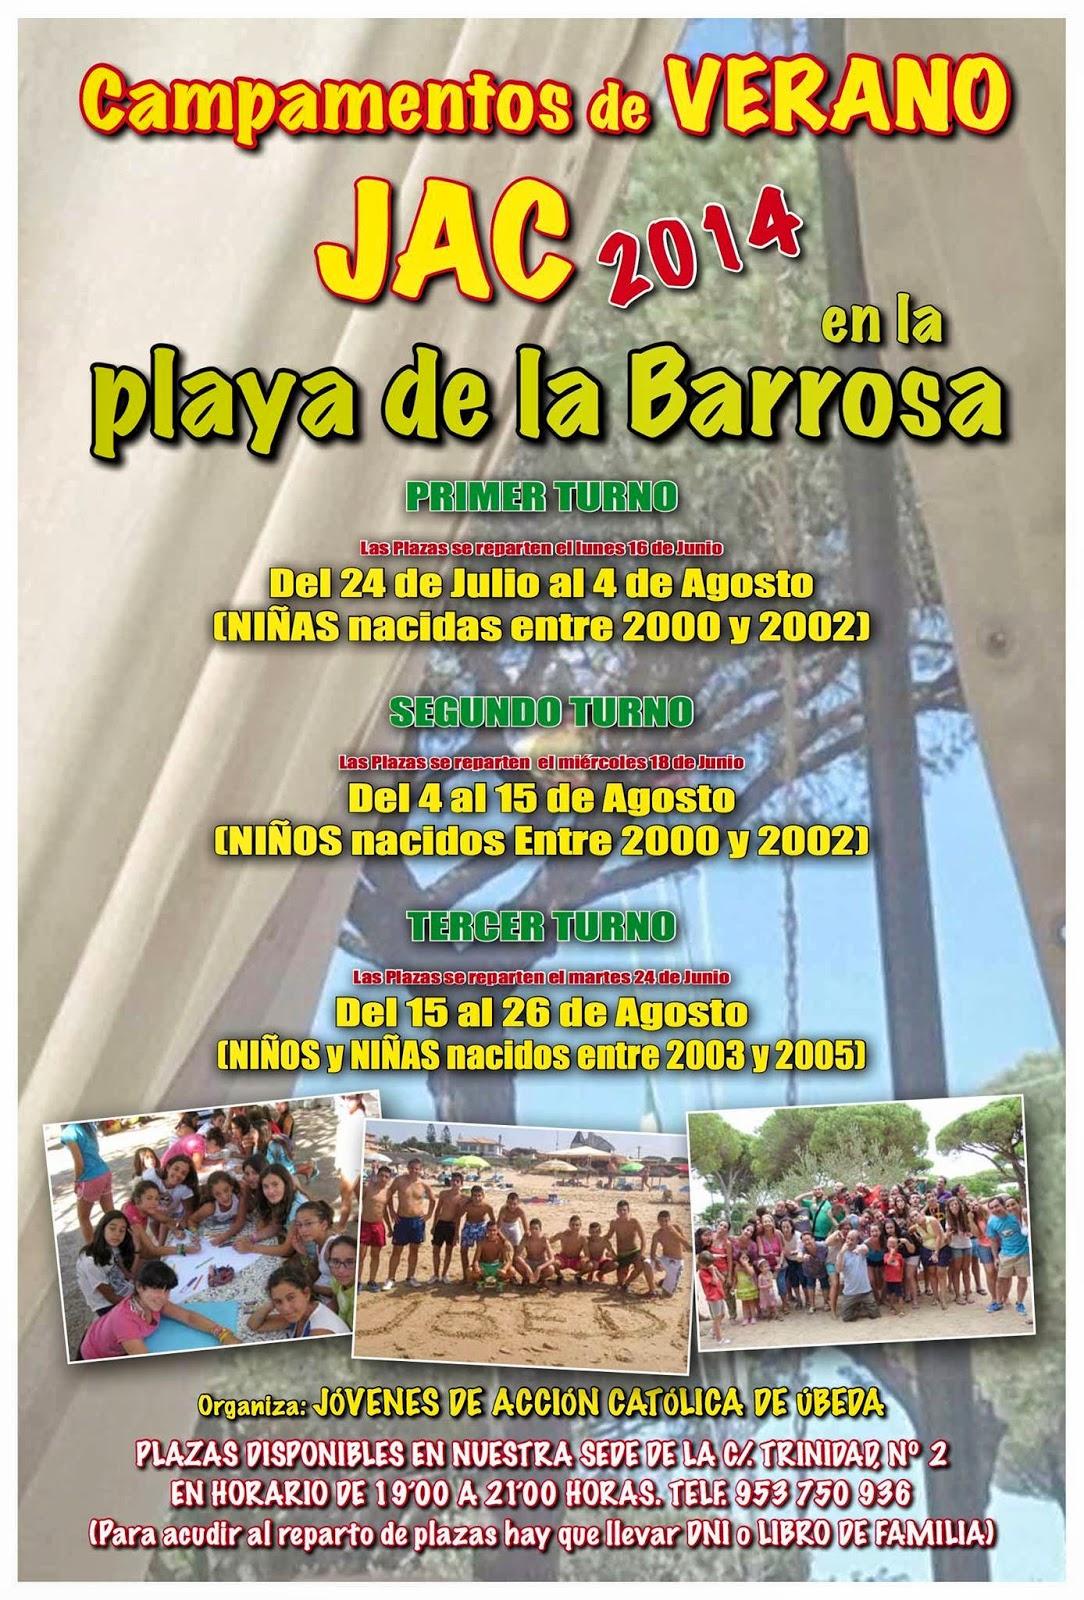 http://www.dechiclana.com/chiclana/playas/la-barrosa.php